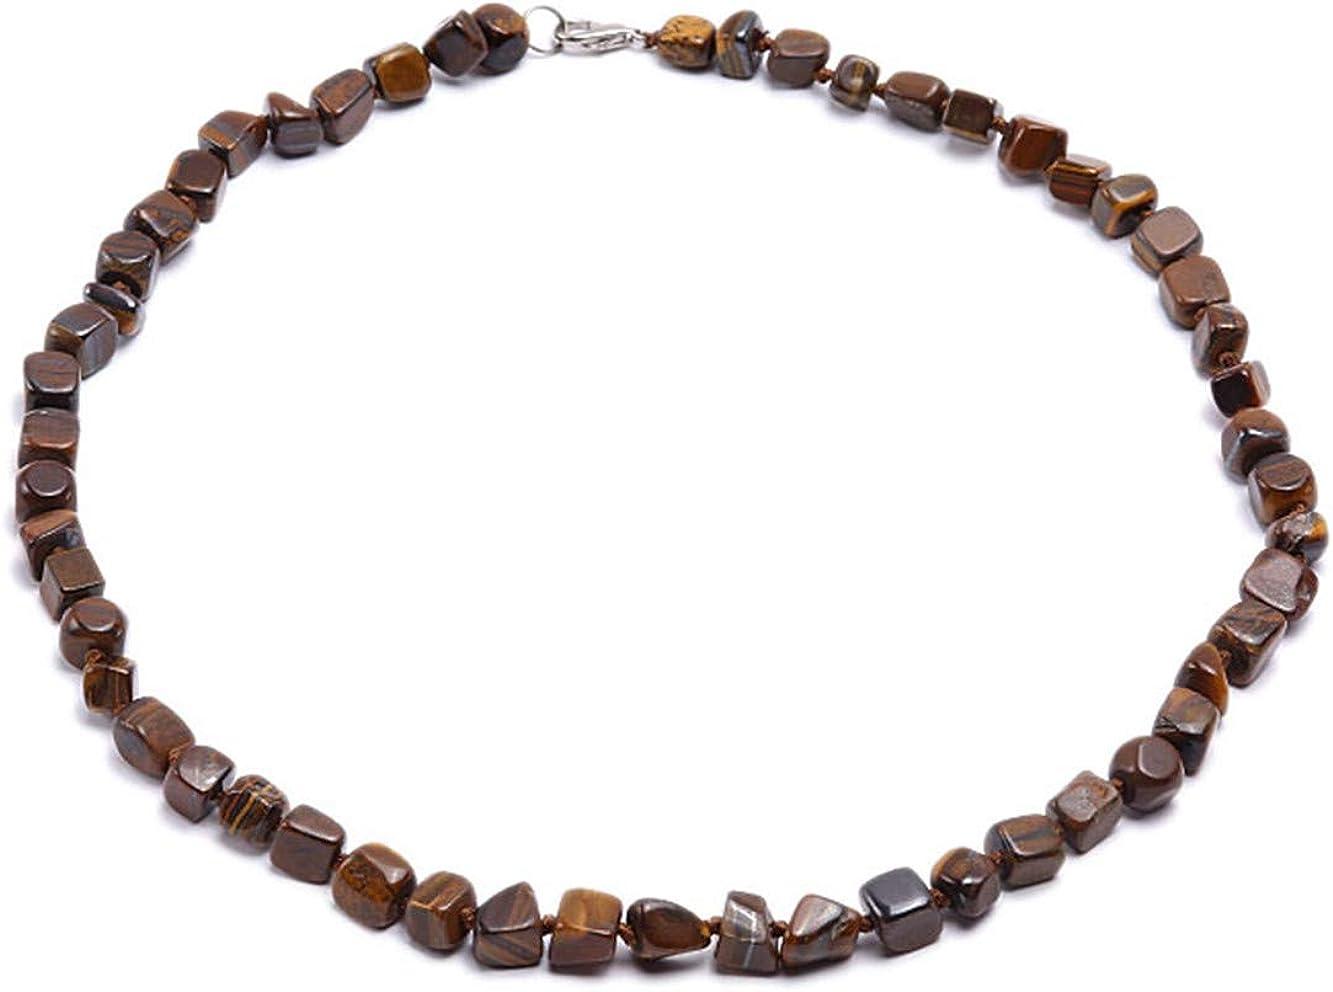 JYXJEWELRY Men Women 7x9mm Irregular Tiger Eye Stone Necklace Single Strand Necklace 23